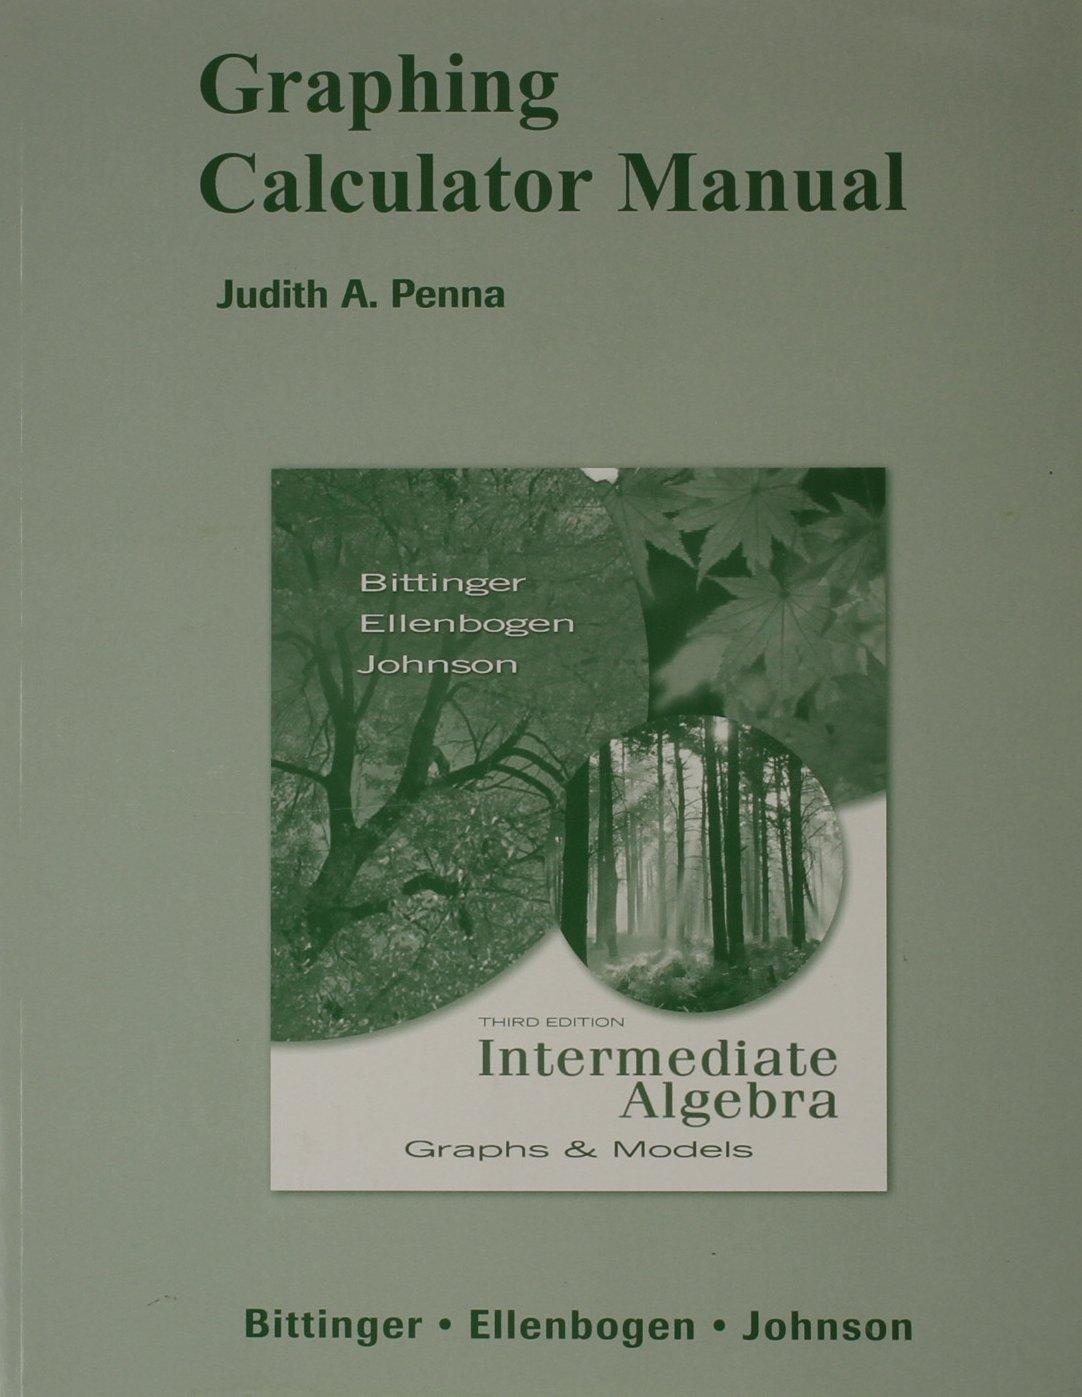 Buy Graphing Calculator Manual for Intermediate Algebra: Graphs & Models  Book Online at Low Prices in India | Graphing Calculator Manual for  Intermediate ...